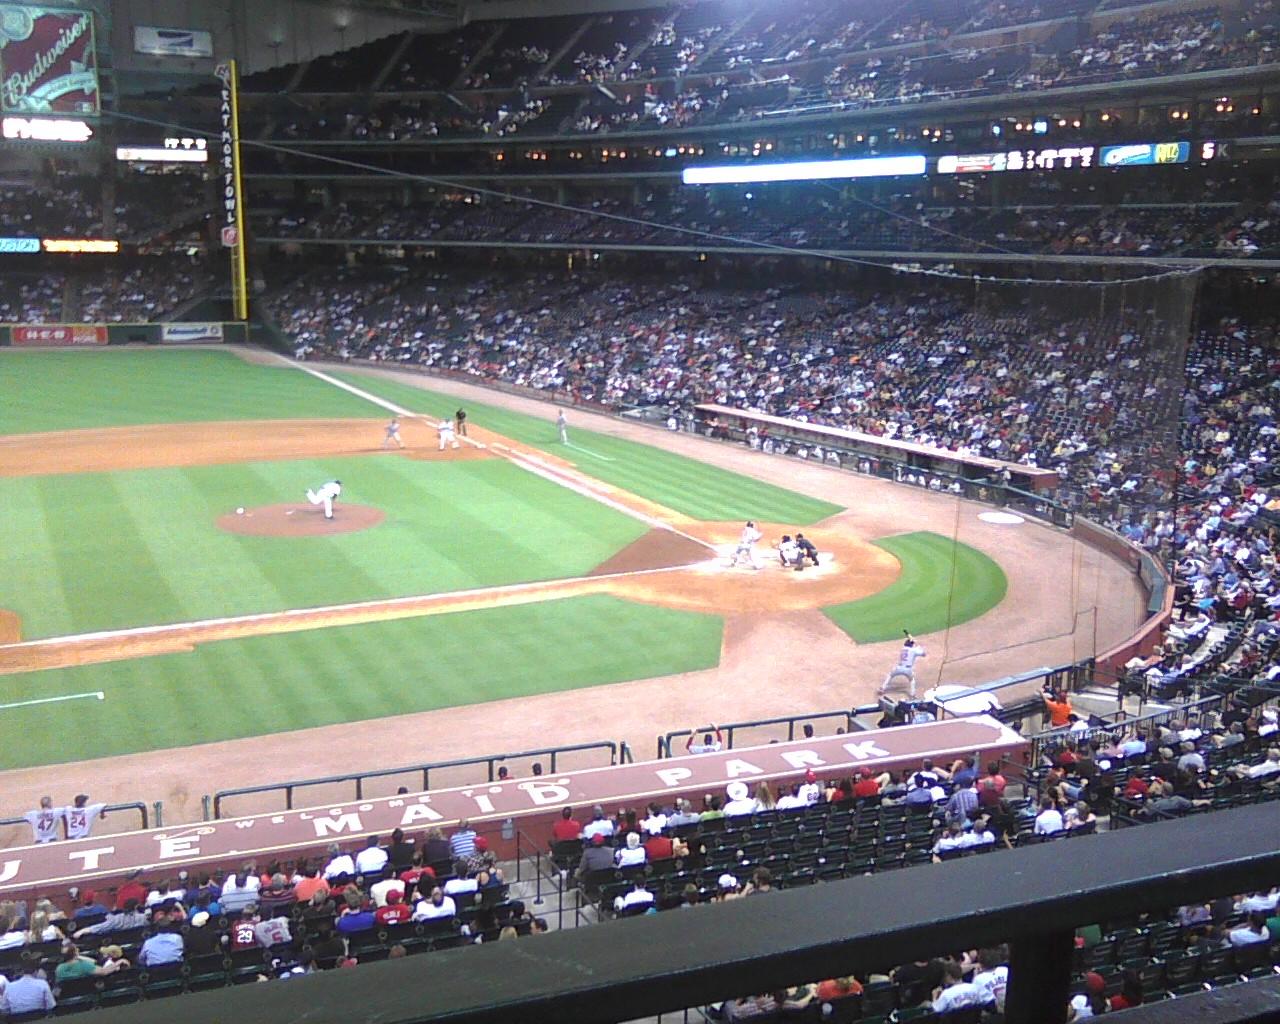 Astros Game - Photo09212105.jpg